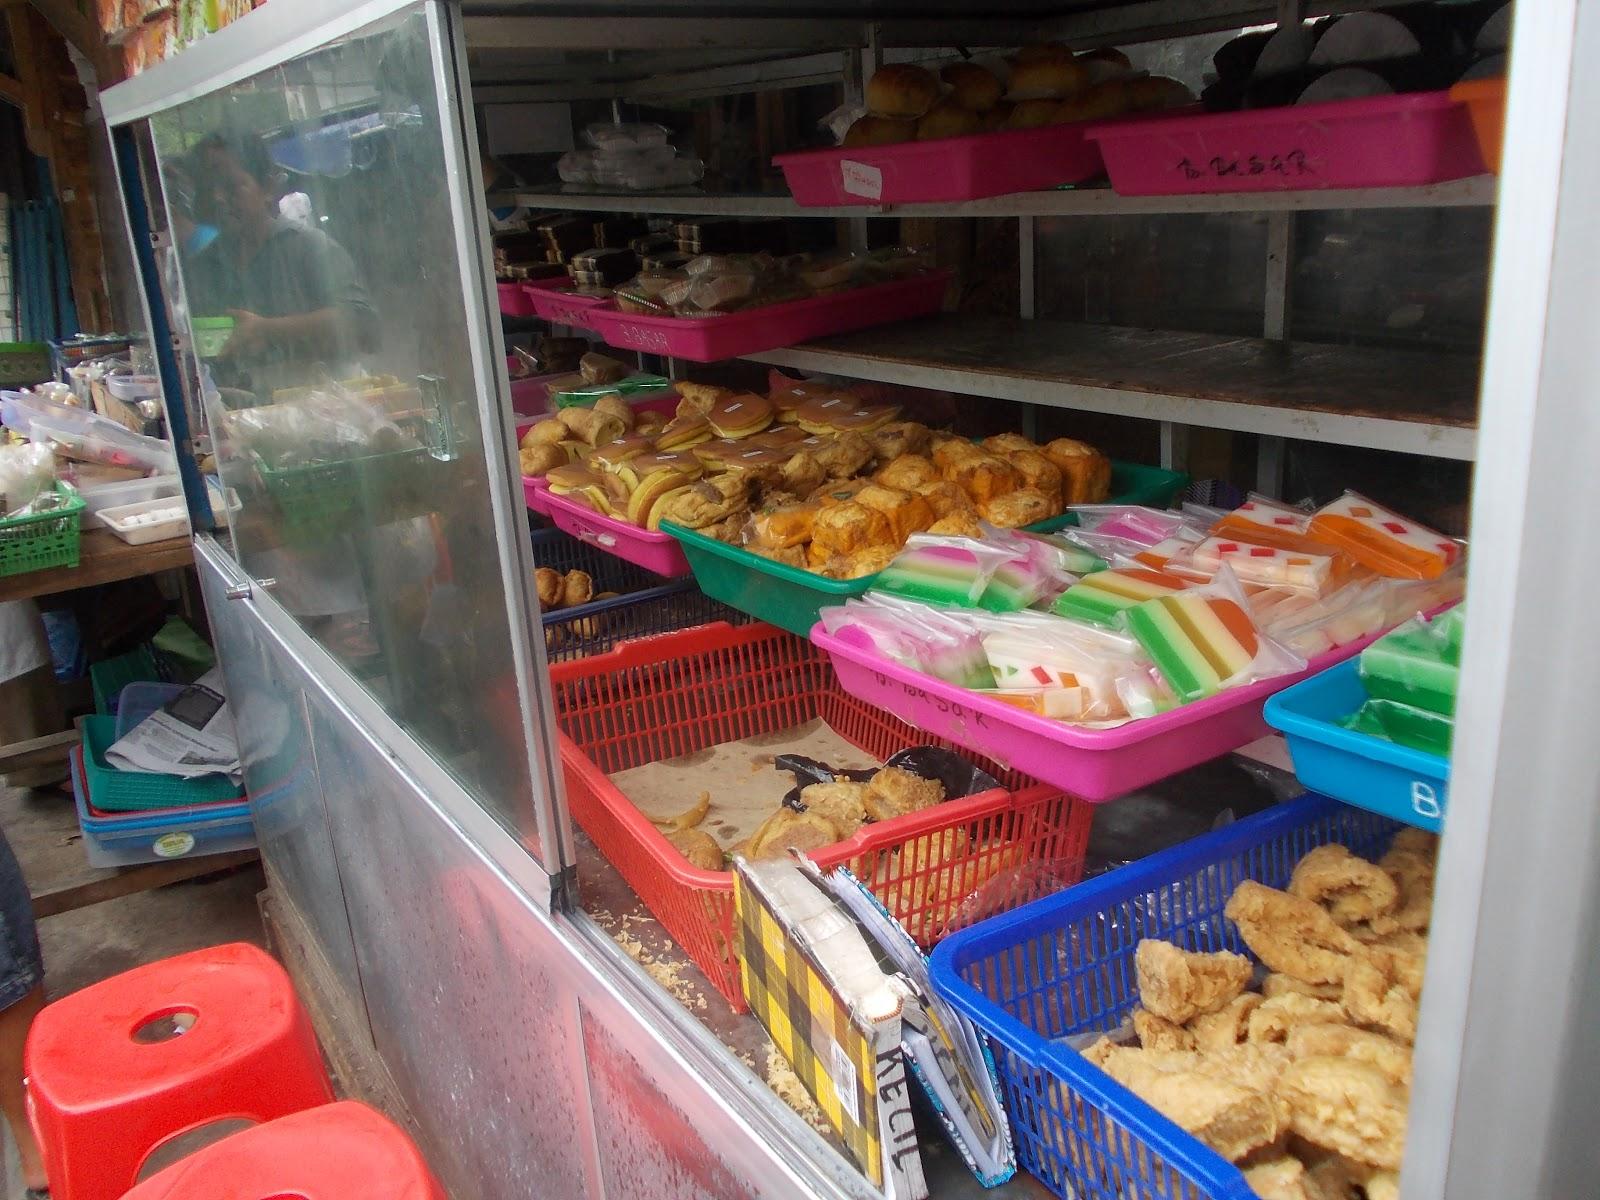 Seputar Magelang Menengok Jajanan Pasar Di Magelang Etalase kue basah